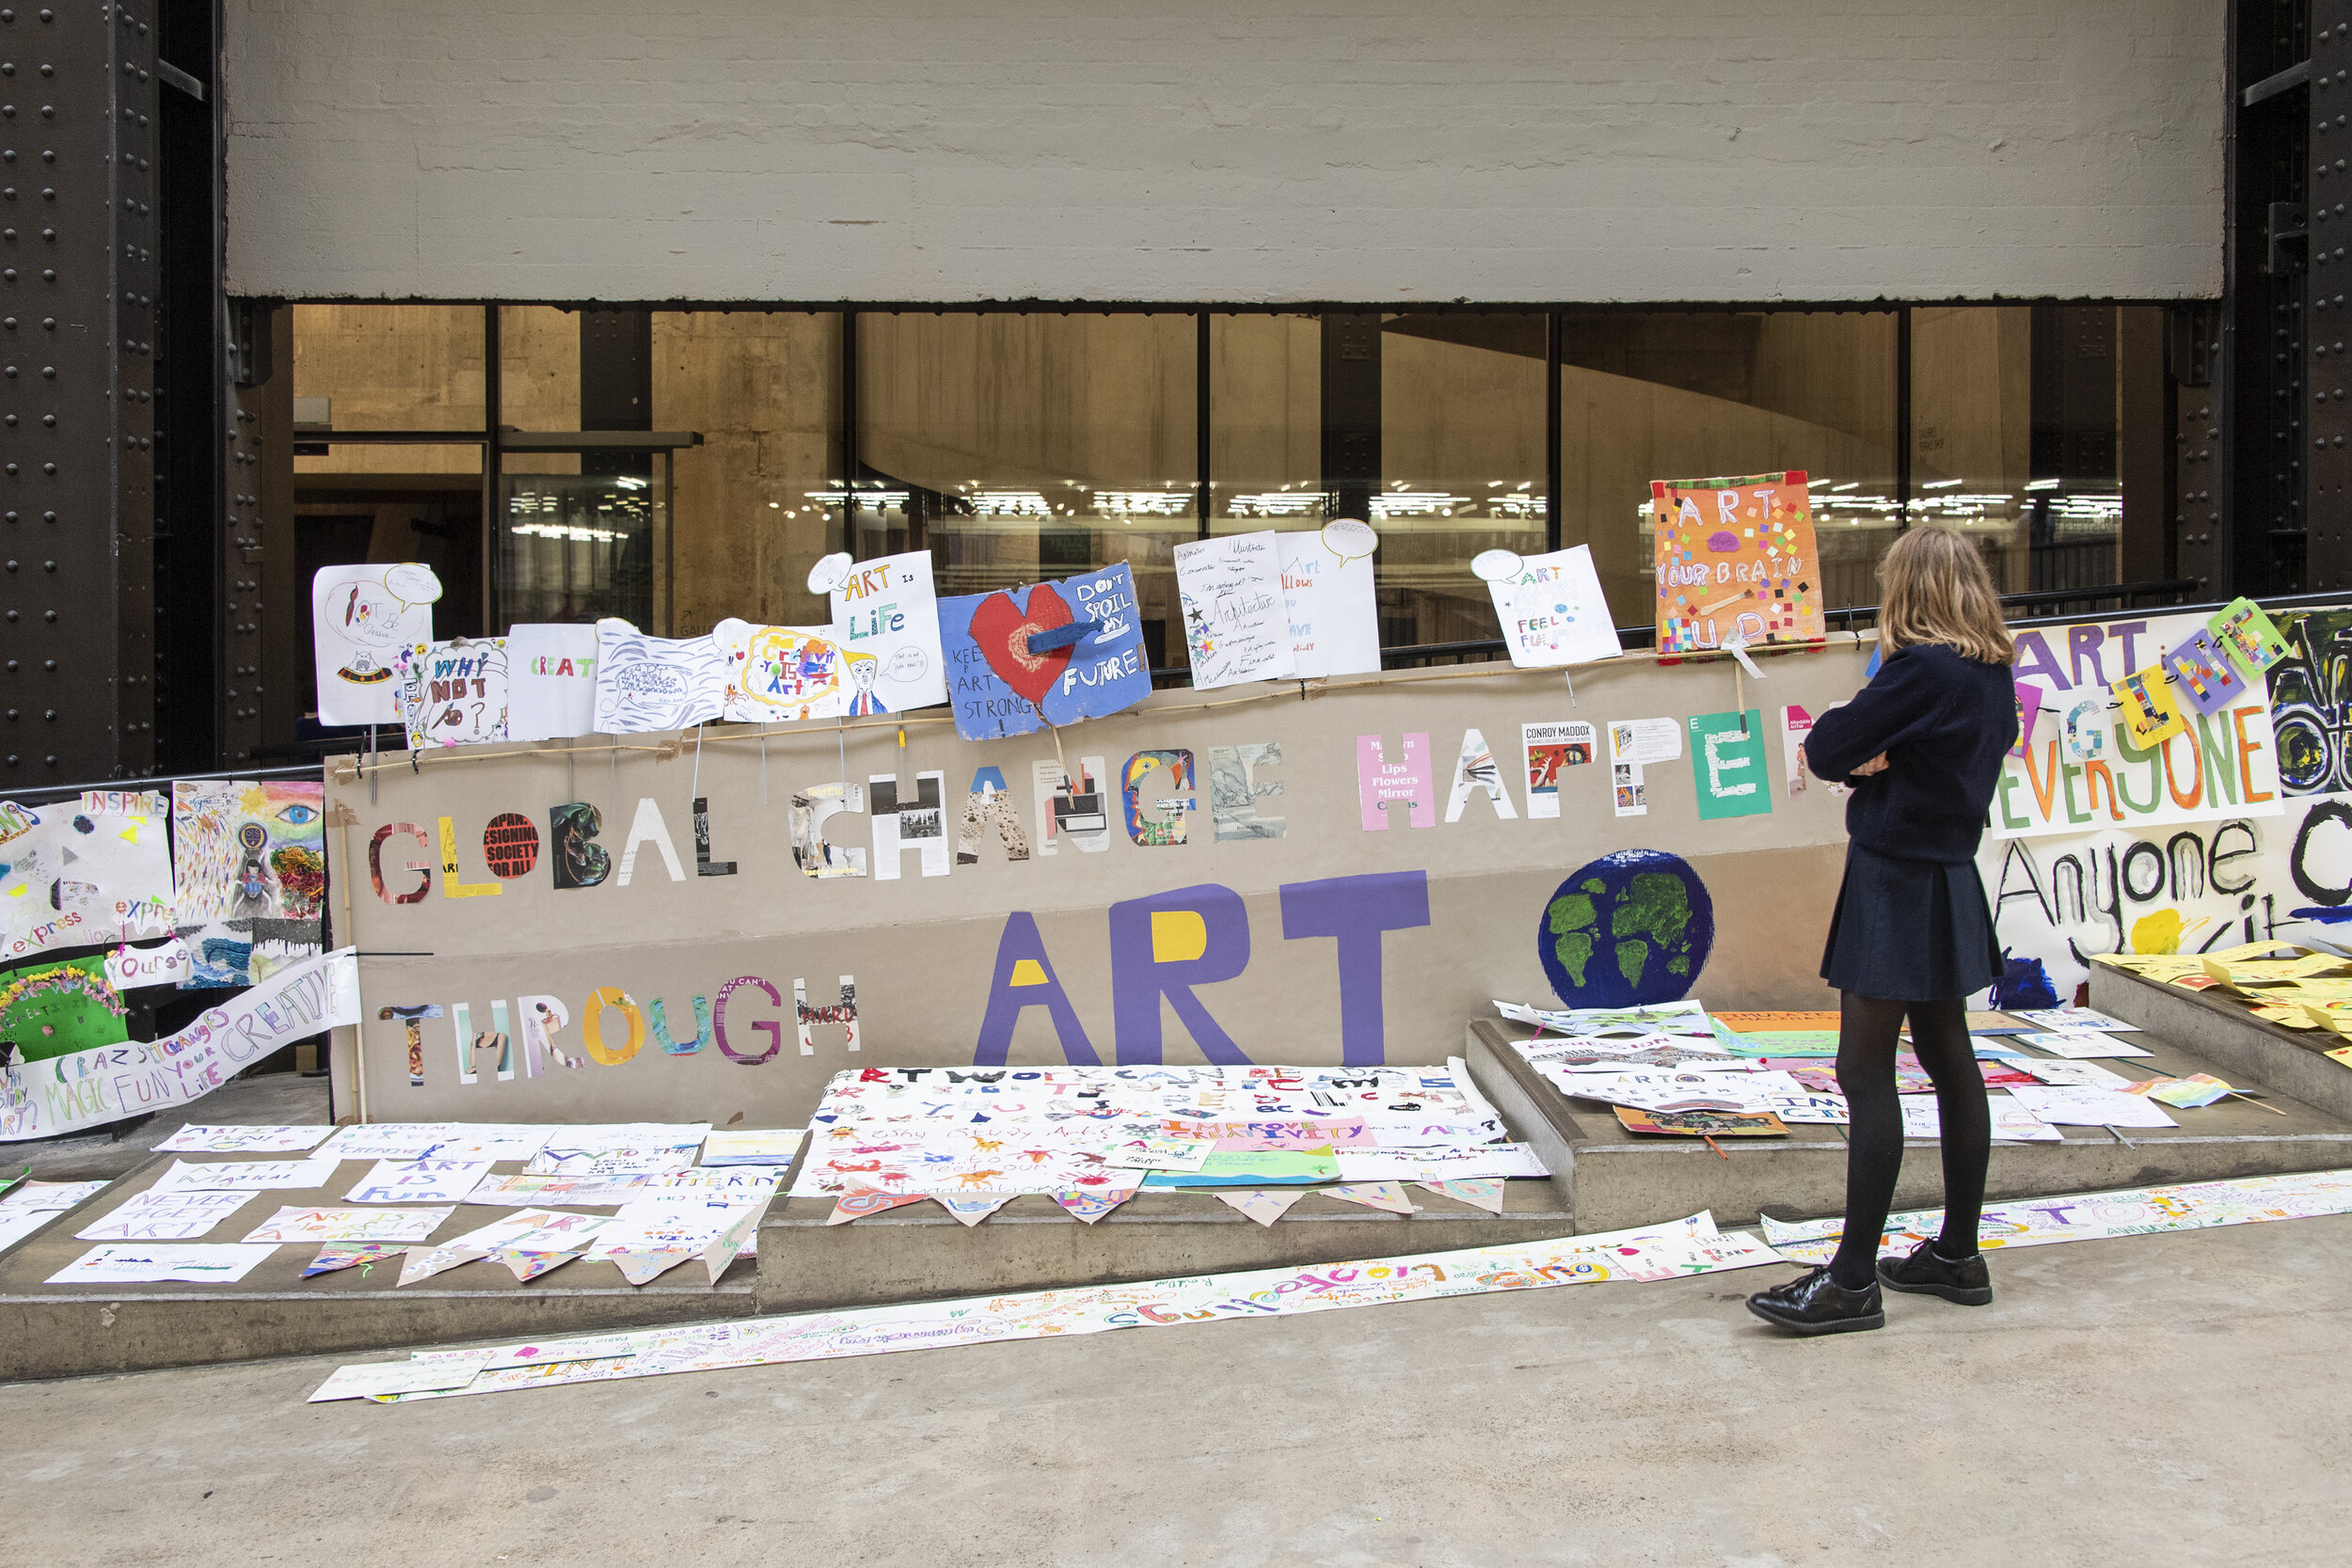 ASSEMBLY, Schools and Teachers Programme, Tate Modern 2019, photo © Tate (Joe Humphries)